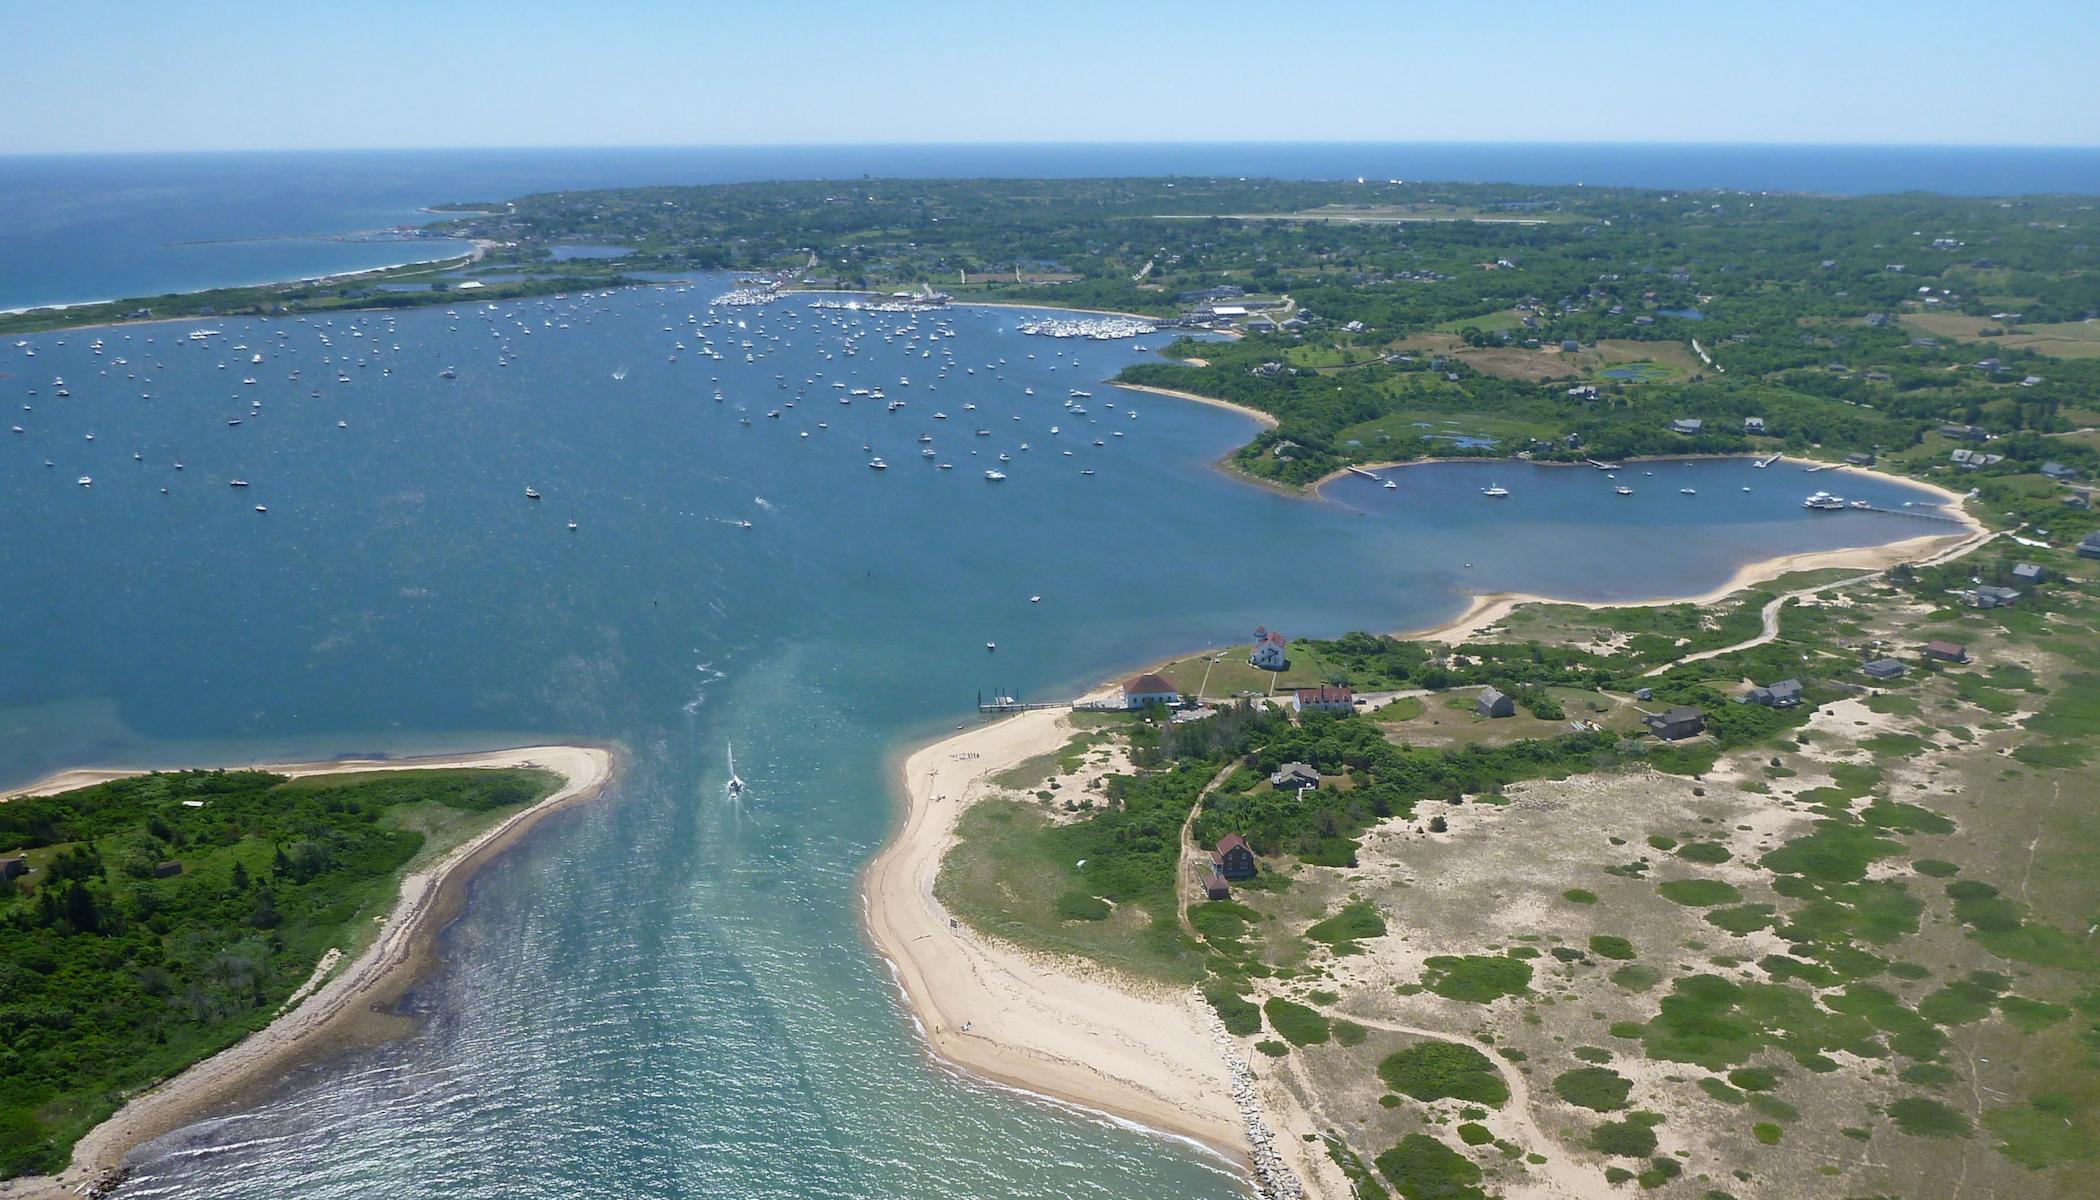 New Harbor Boat Basin from afar